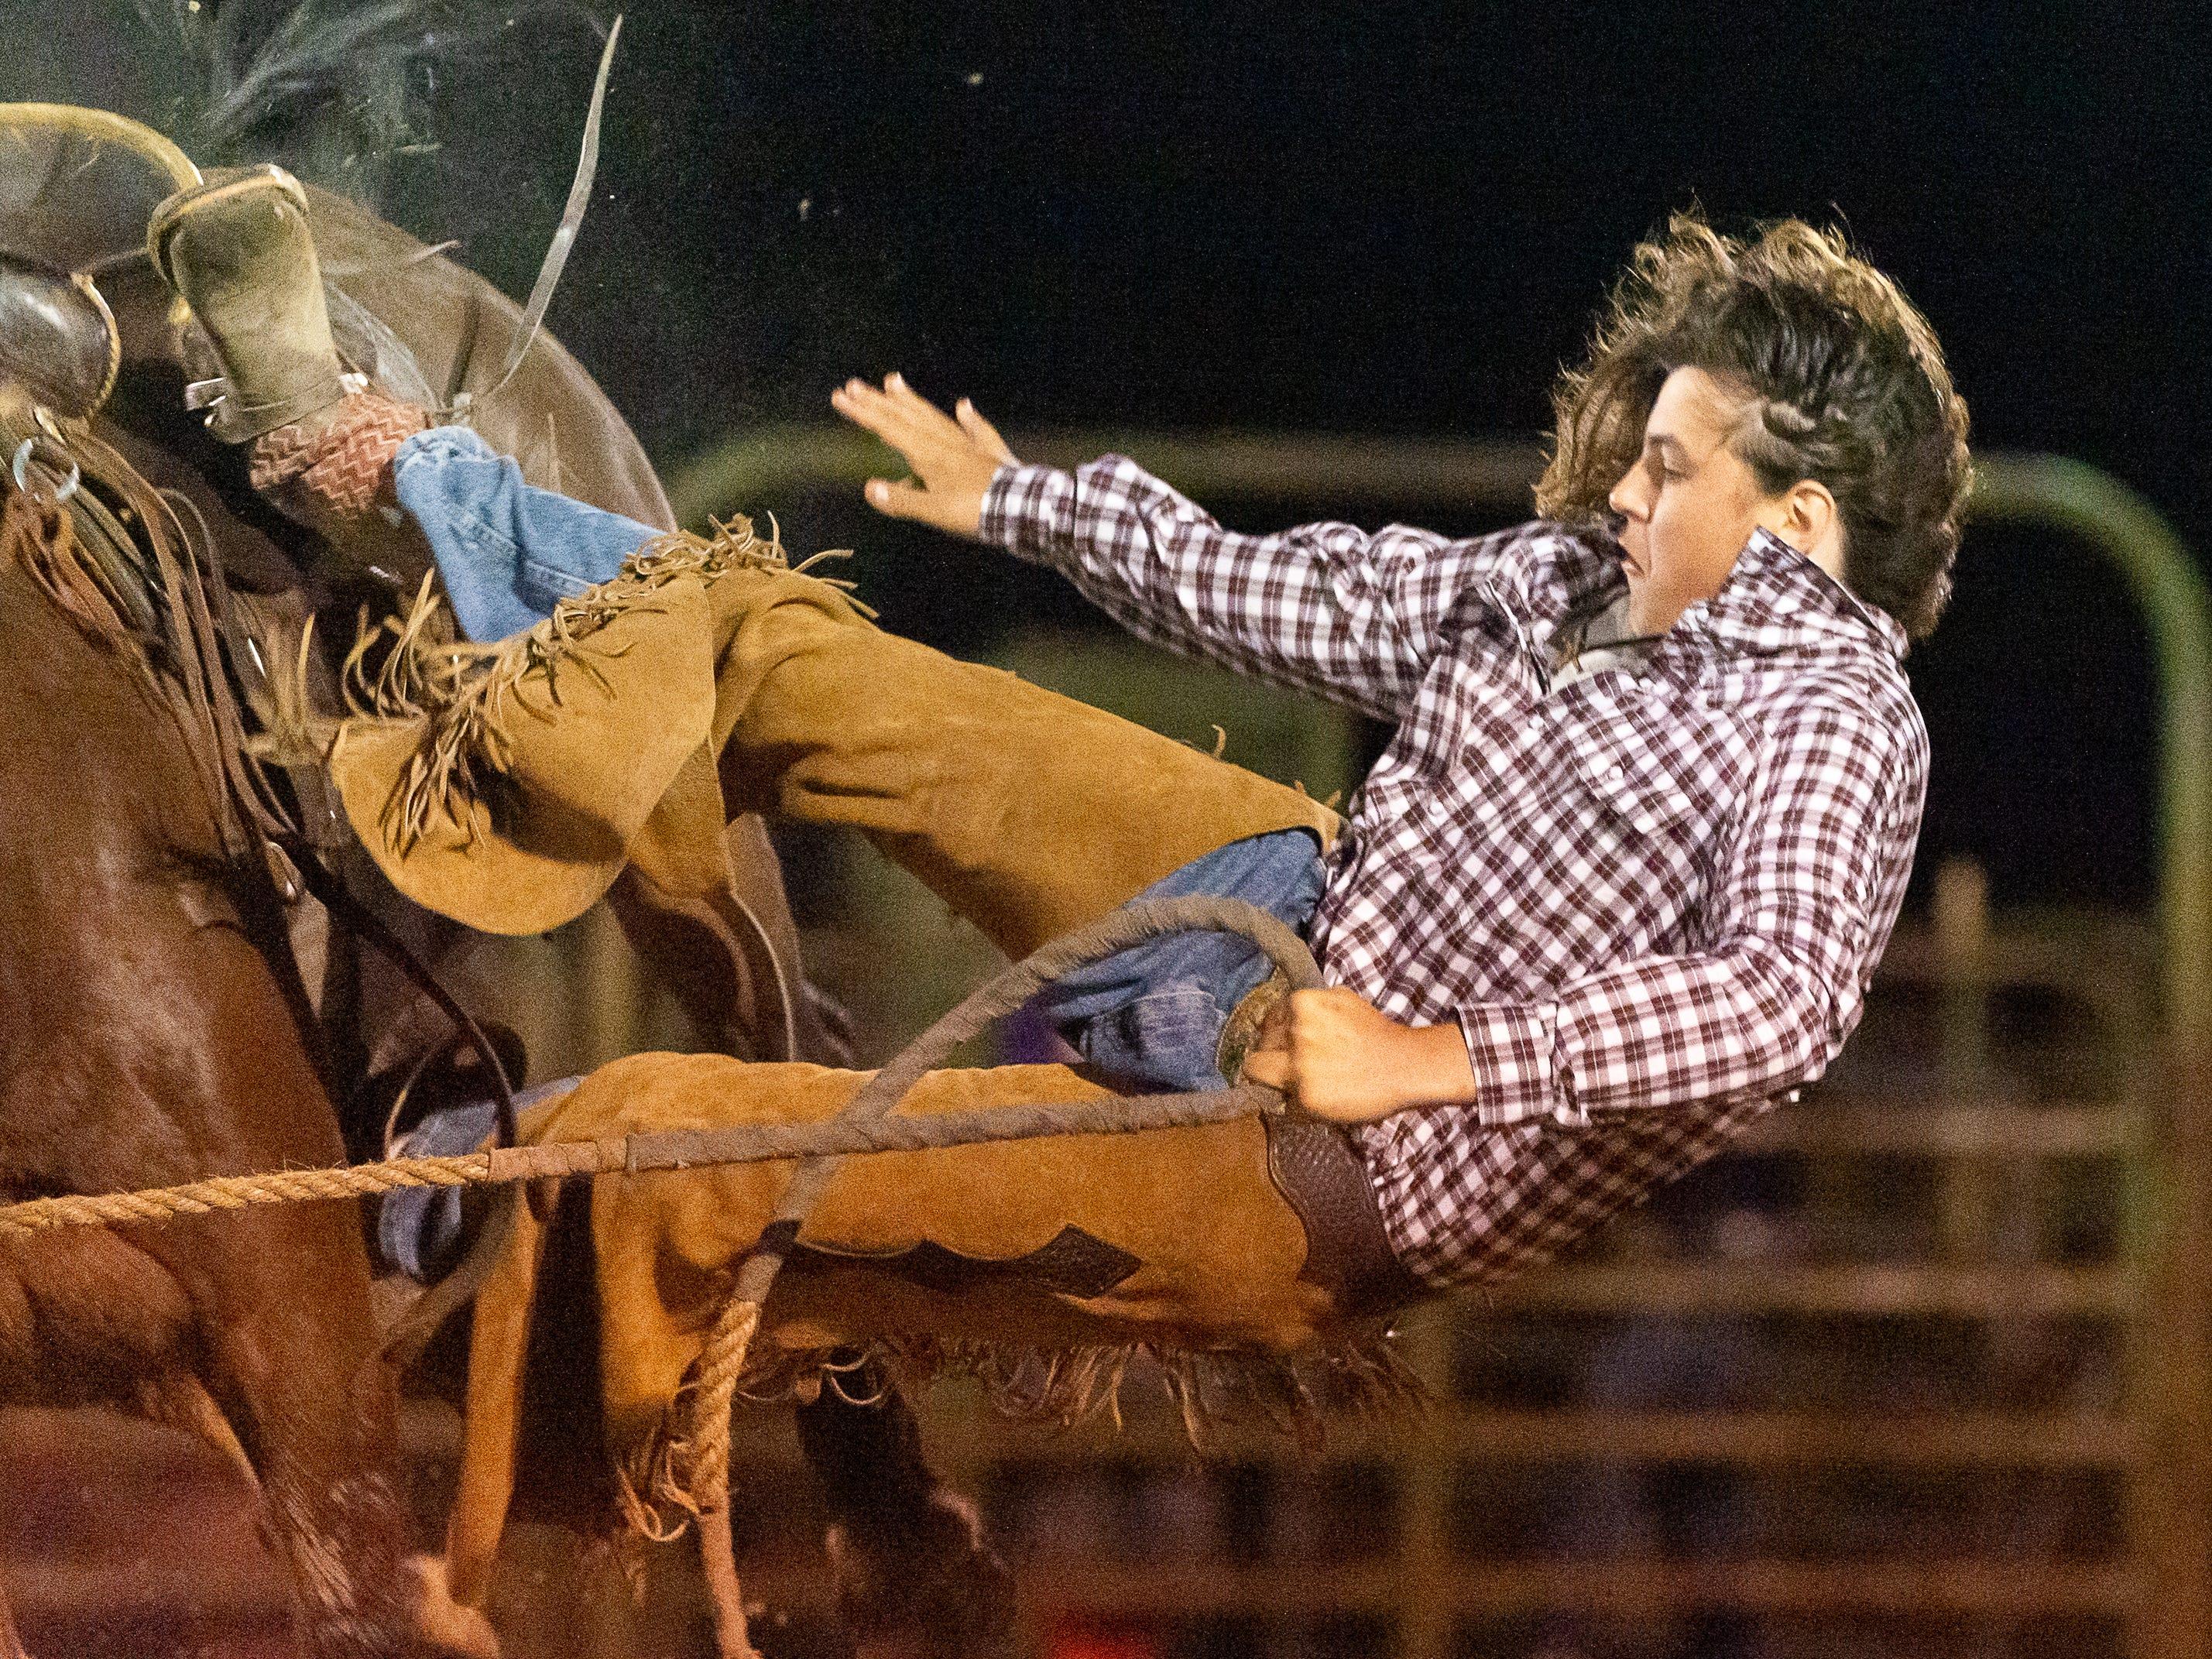 Cajun Rodeo Association host the Cowboys Spring Stampede 19 Rodeo at Cowboys Arena in Scott, LA.. Friday, April 12, 2019.